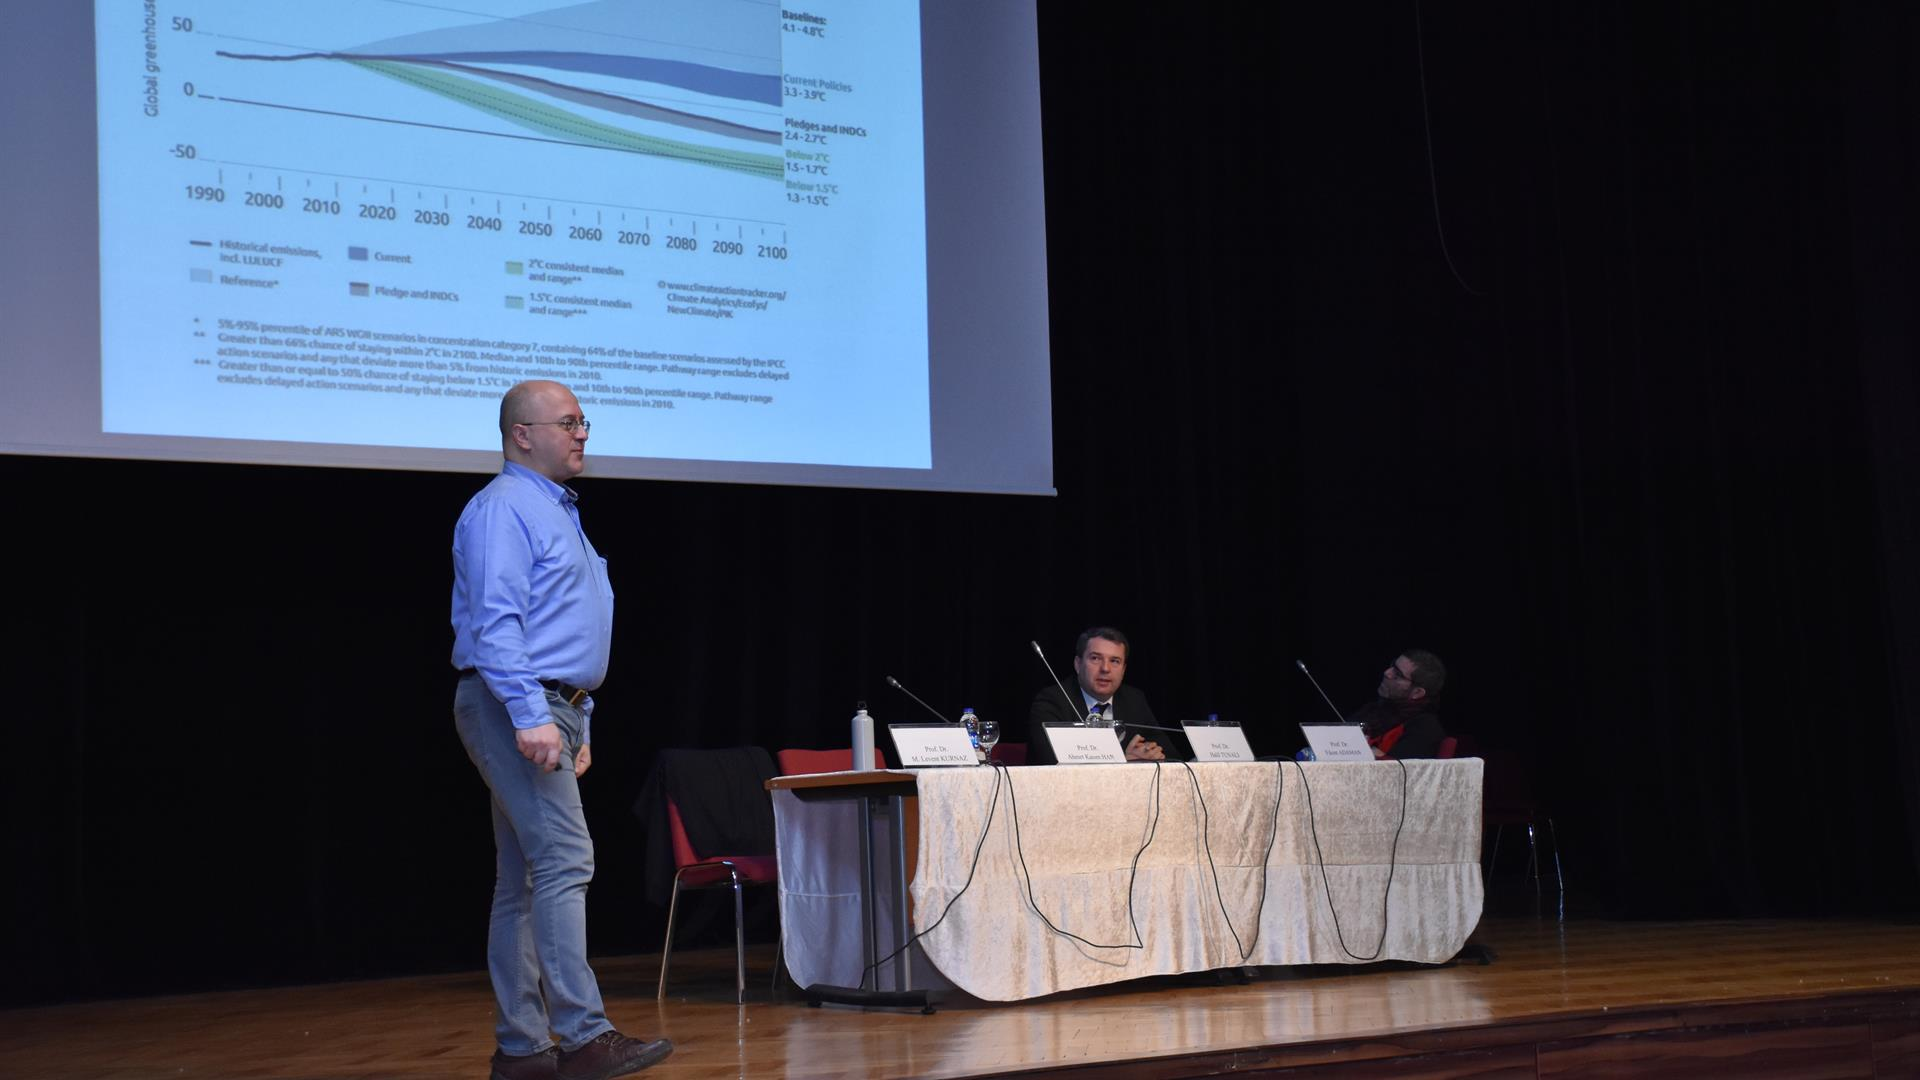 iklim-krizi-ve-iktisat-konferansı